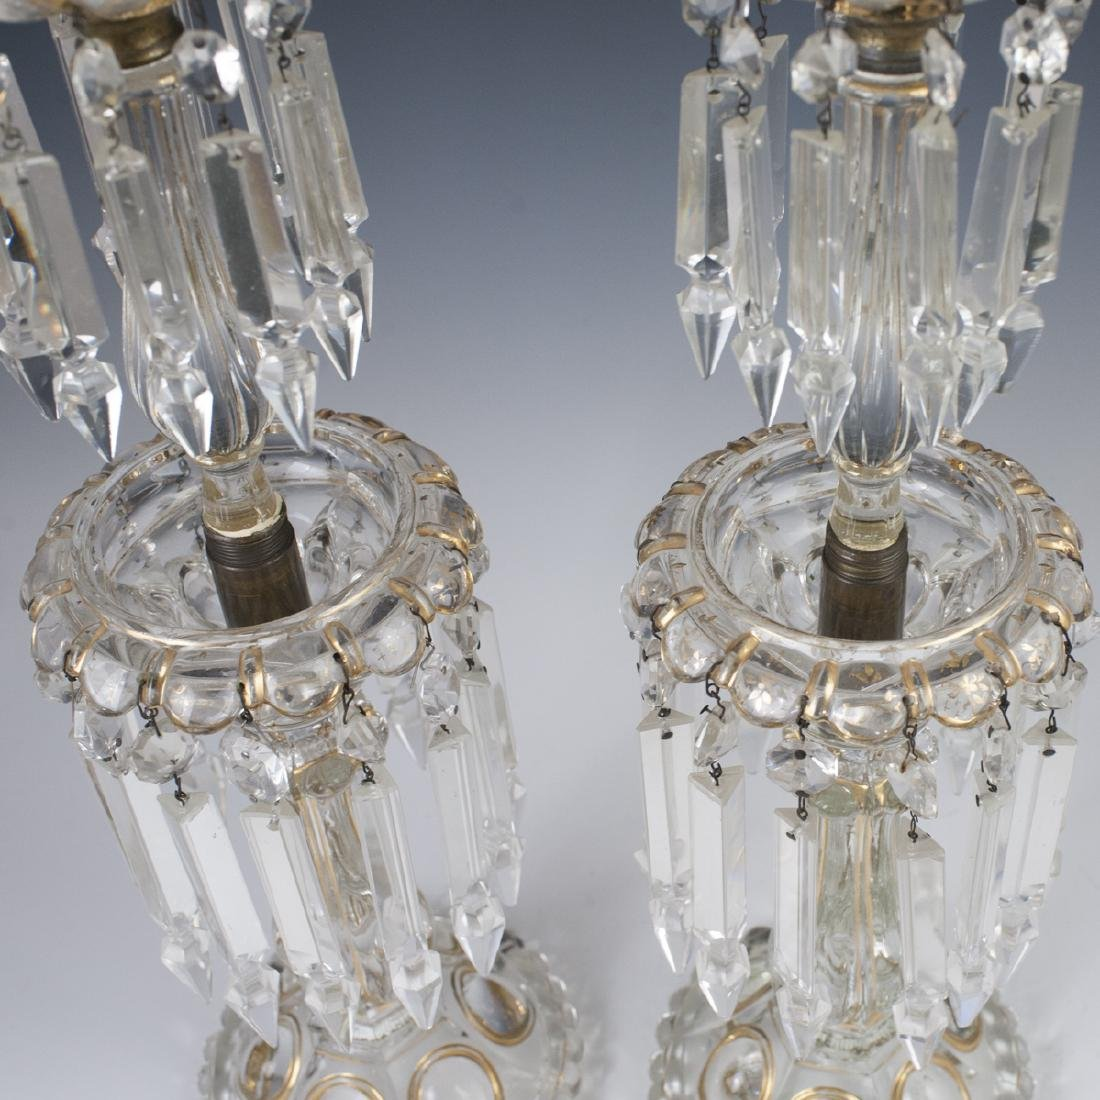 Antique Crystal Candlesticks - 5